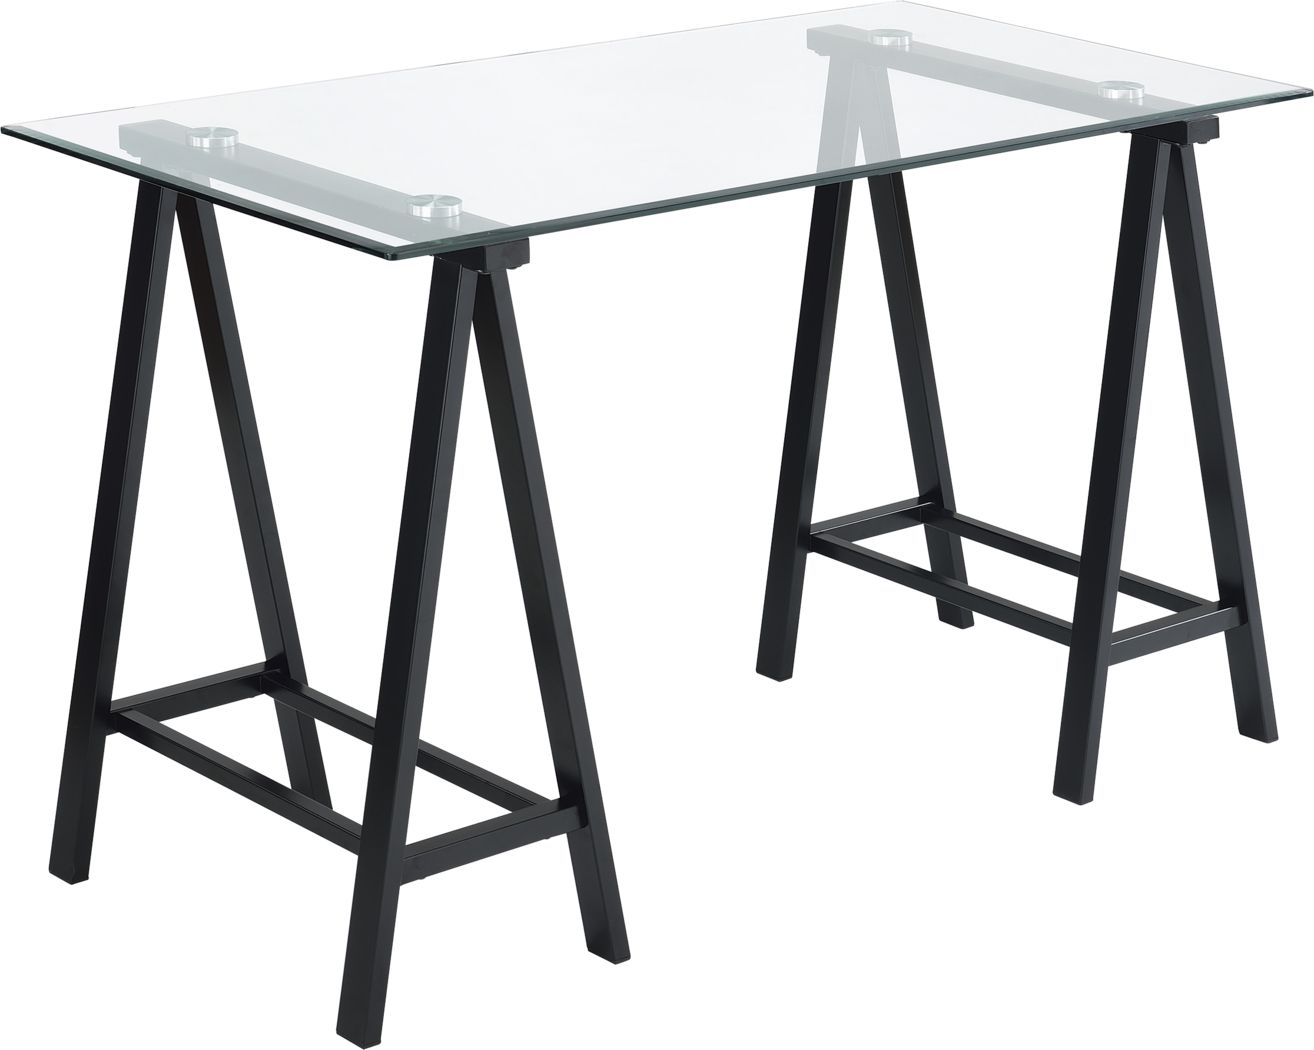 Lymenta Black Desk